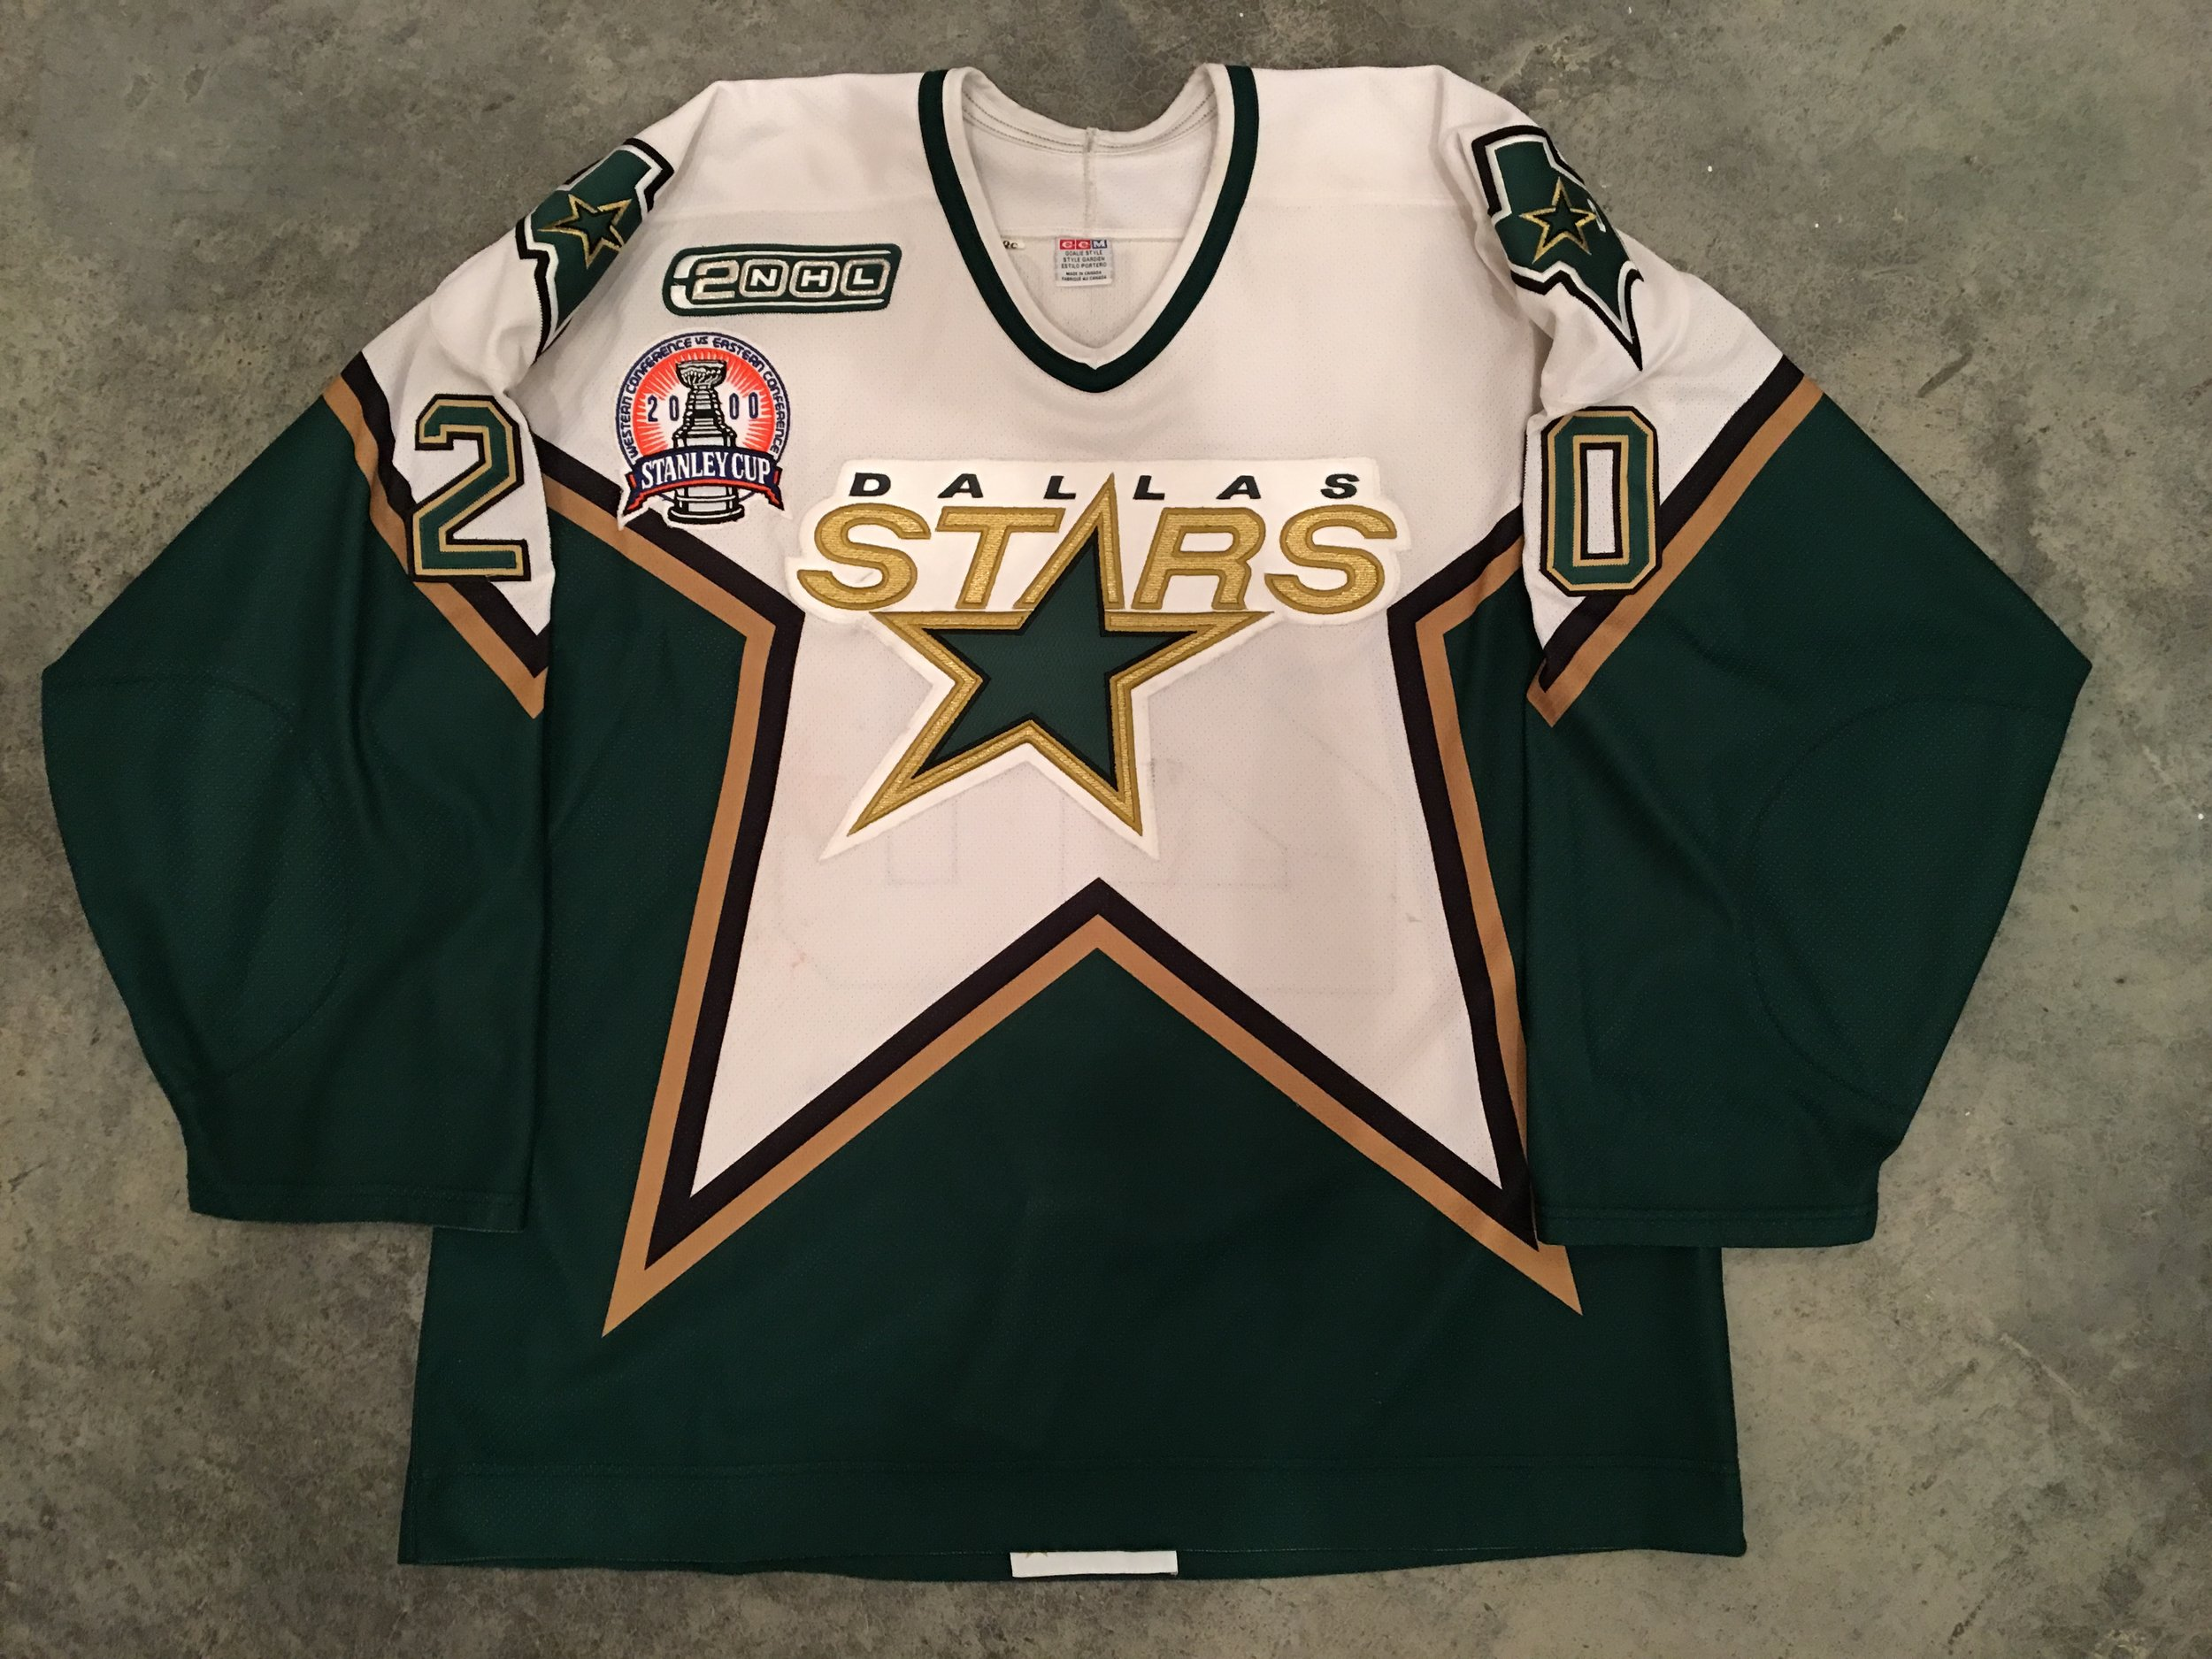 2000 Dallas Starts Stanley Cup Finals Game Worn Road Jersey - Ed Belfour